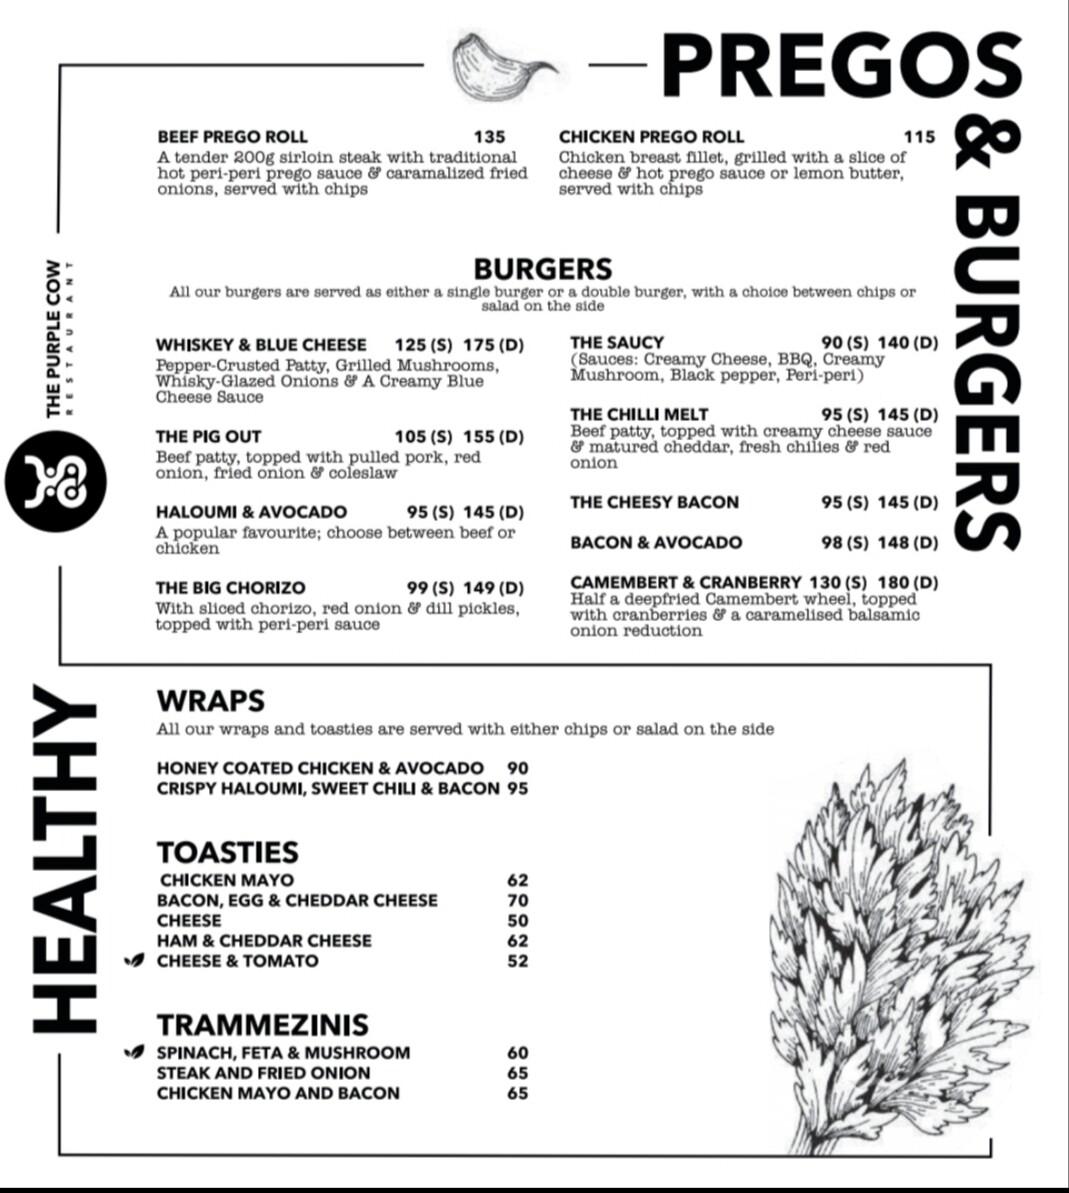 Burgers & Pregos